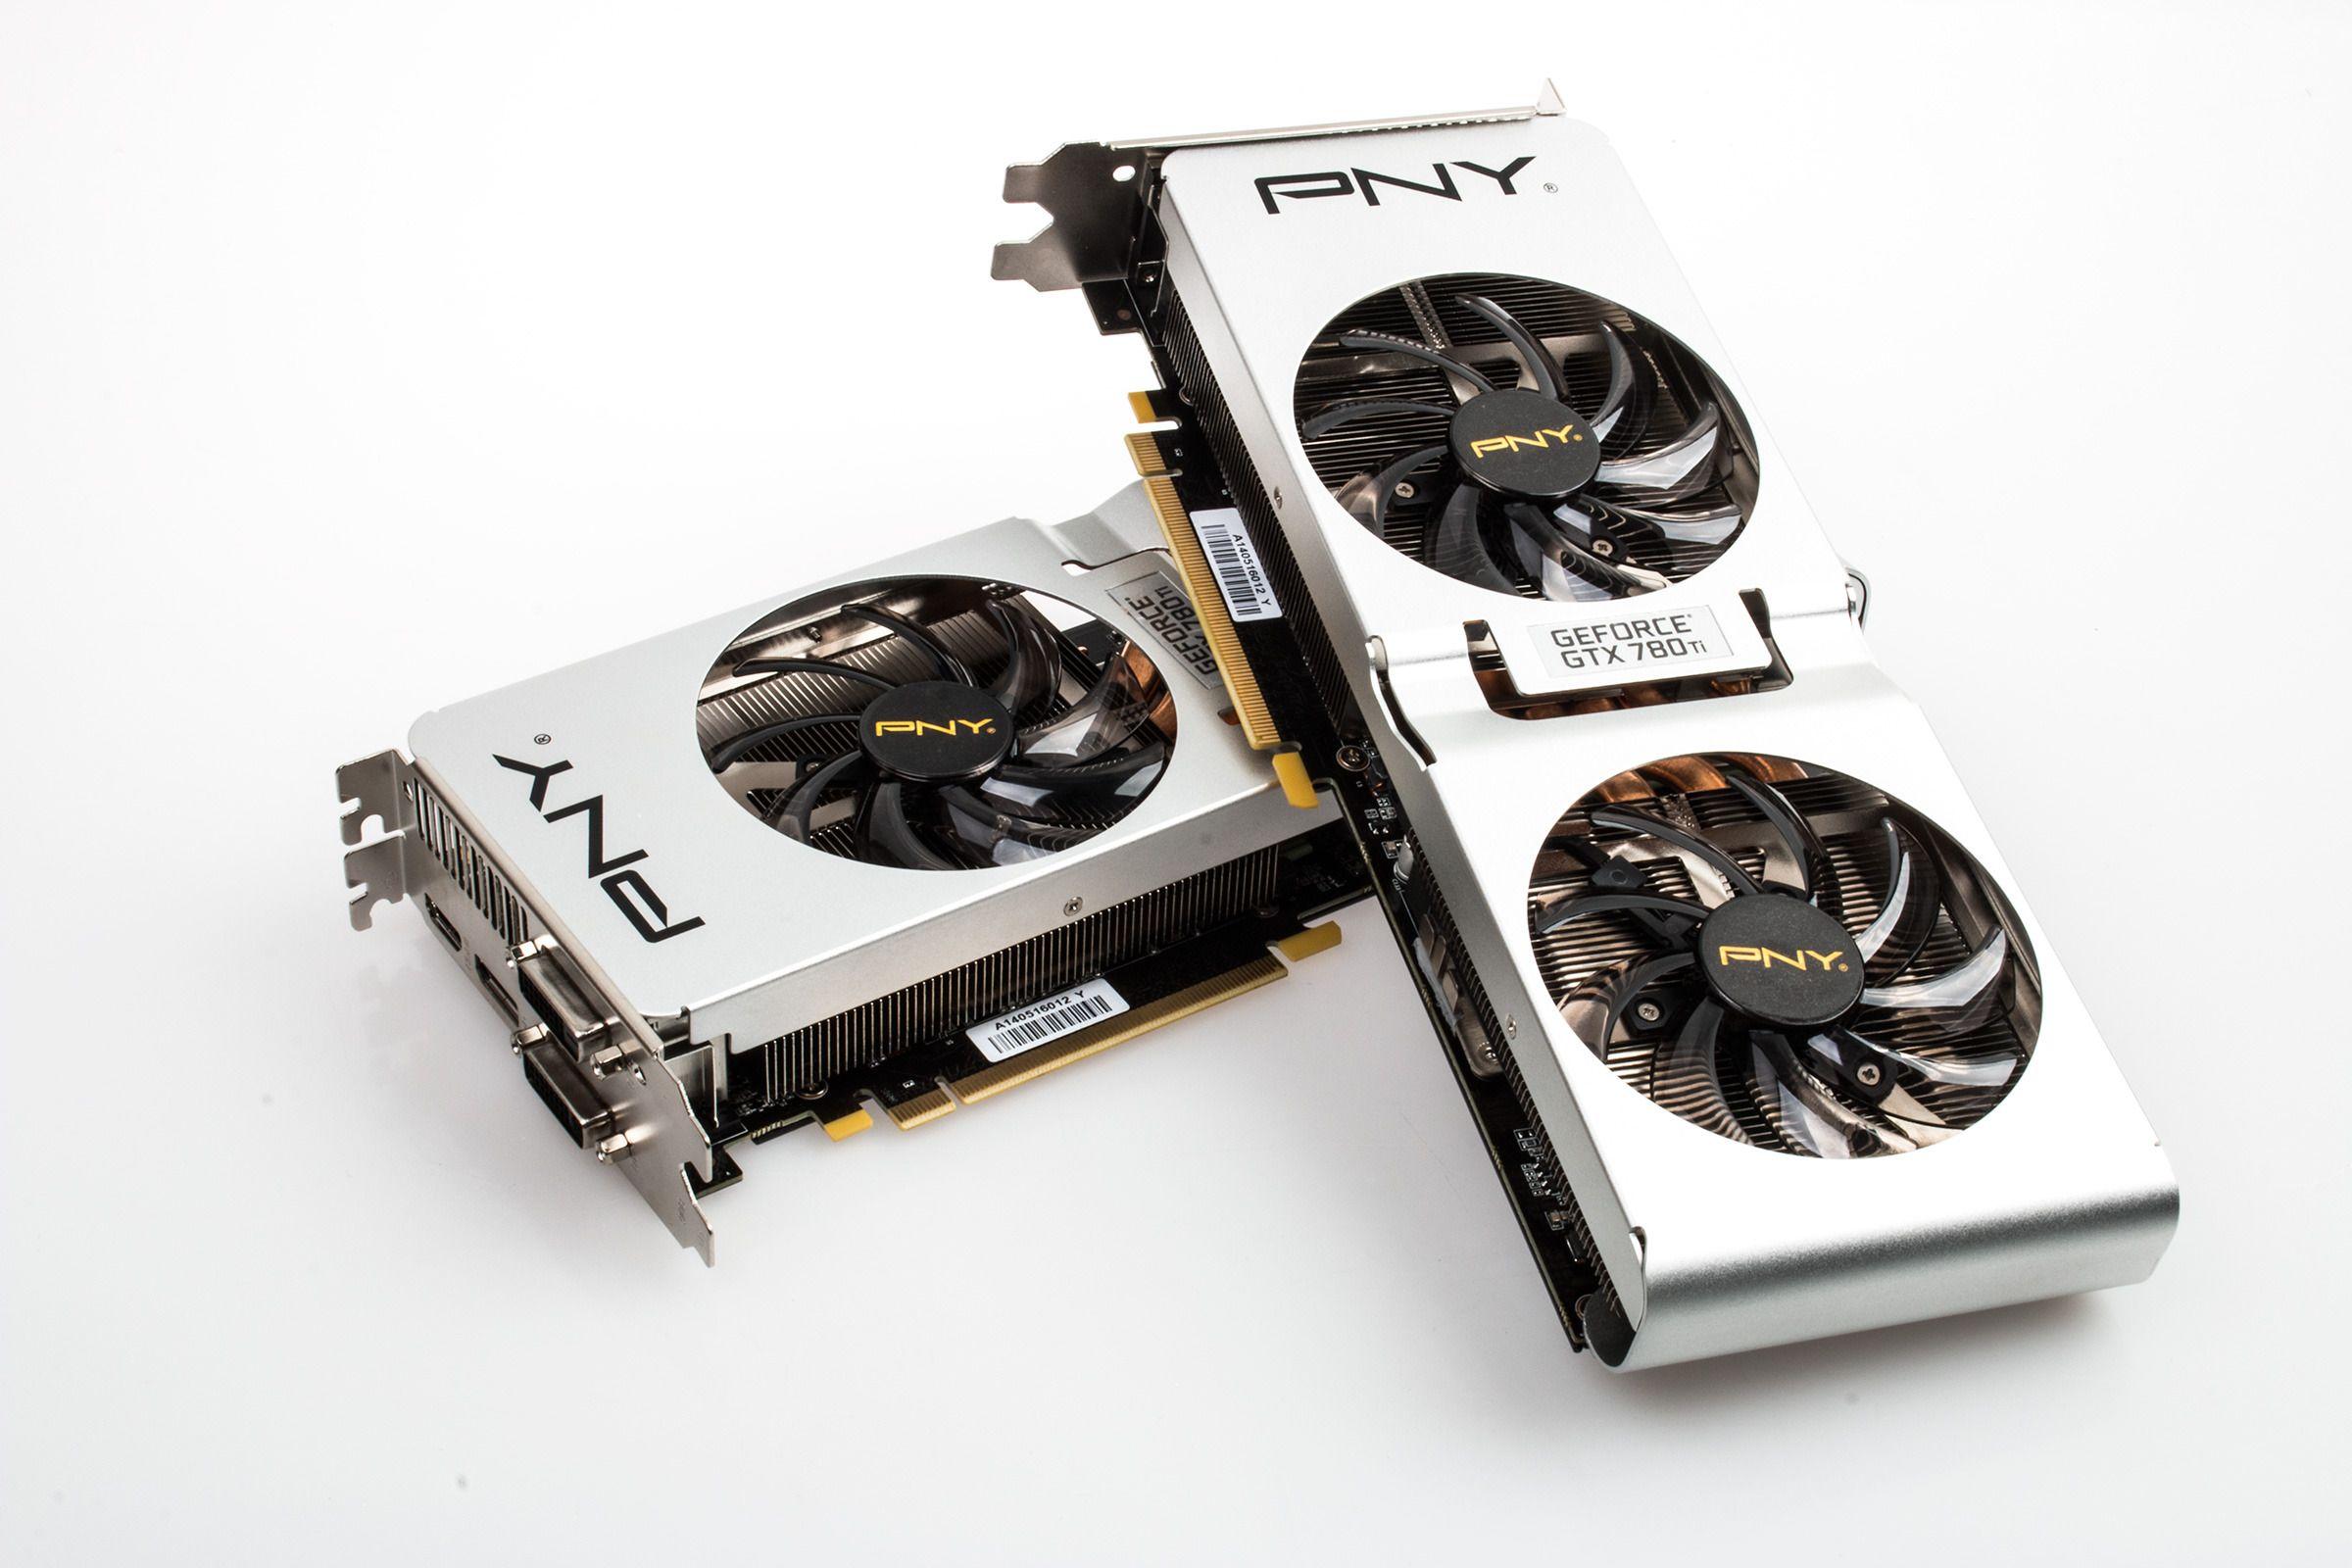 PNY XLR8 GeForce GTX 780 Ti.Foto: Varg Aamo, Hardware.no